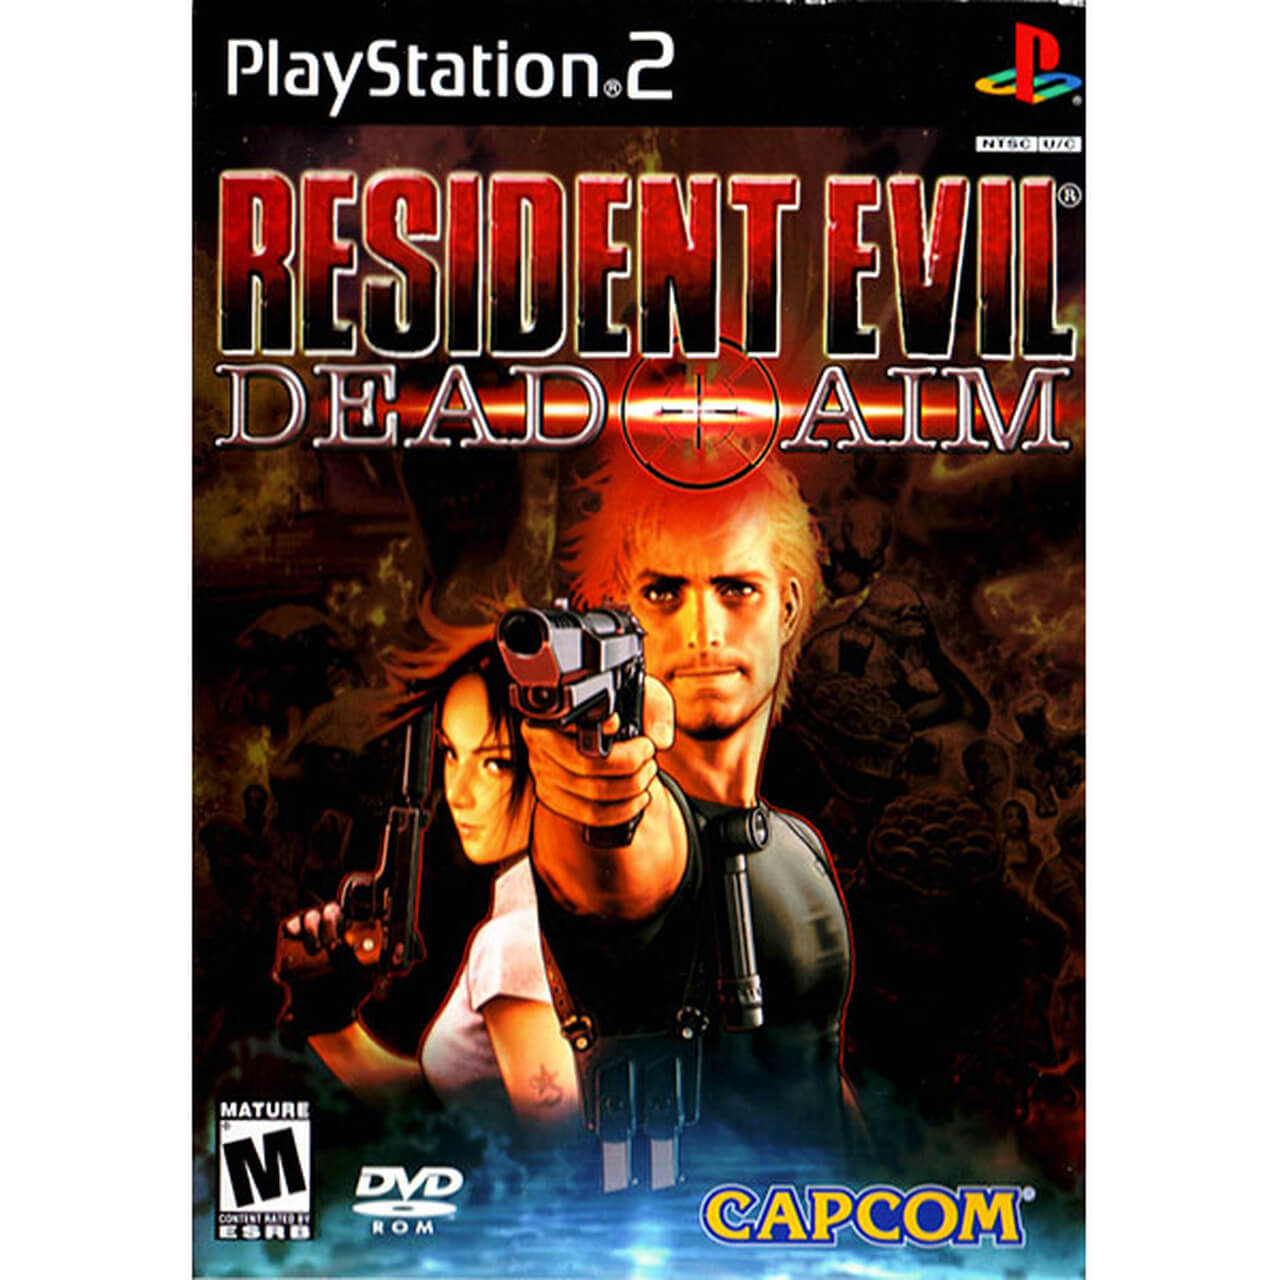 Resident Evil Dead Aim Ps2 Iso Playstation 2 Roms